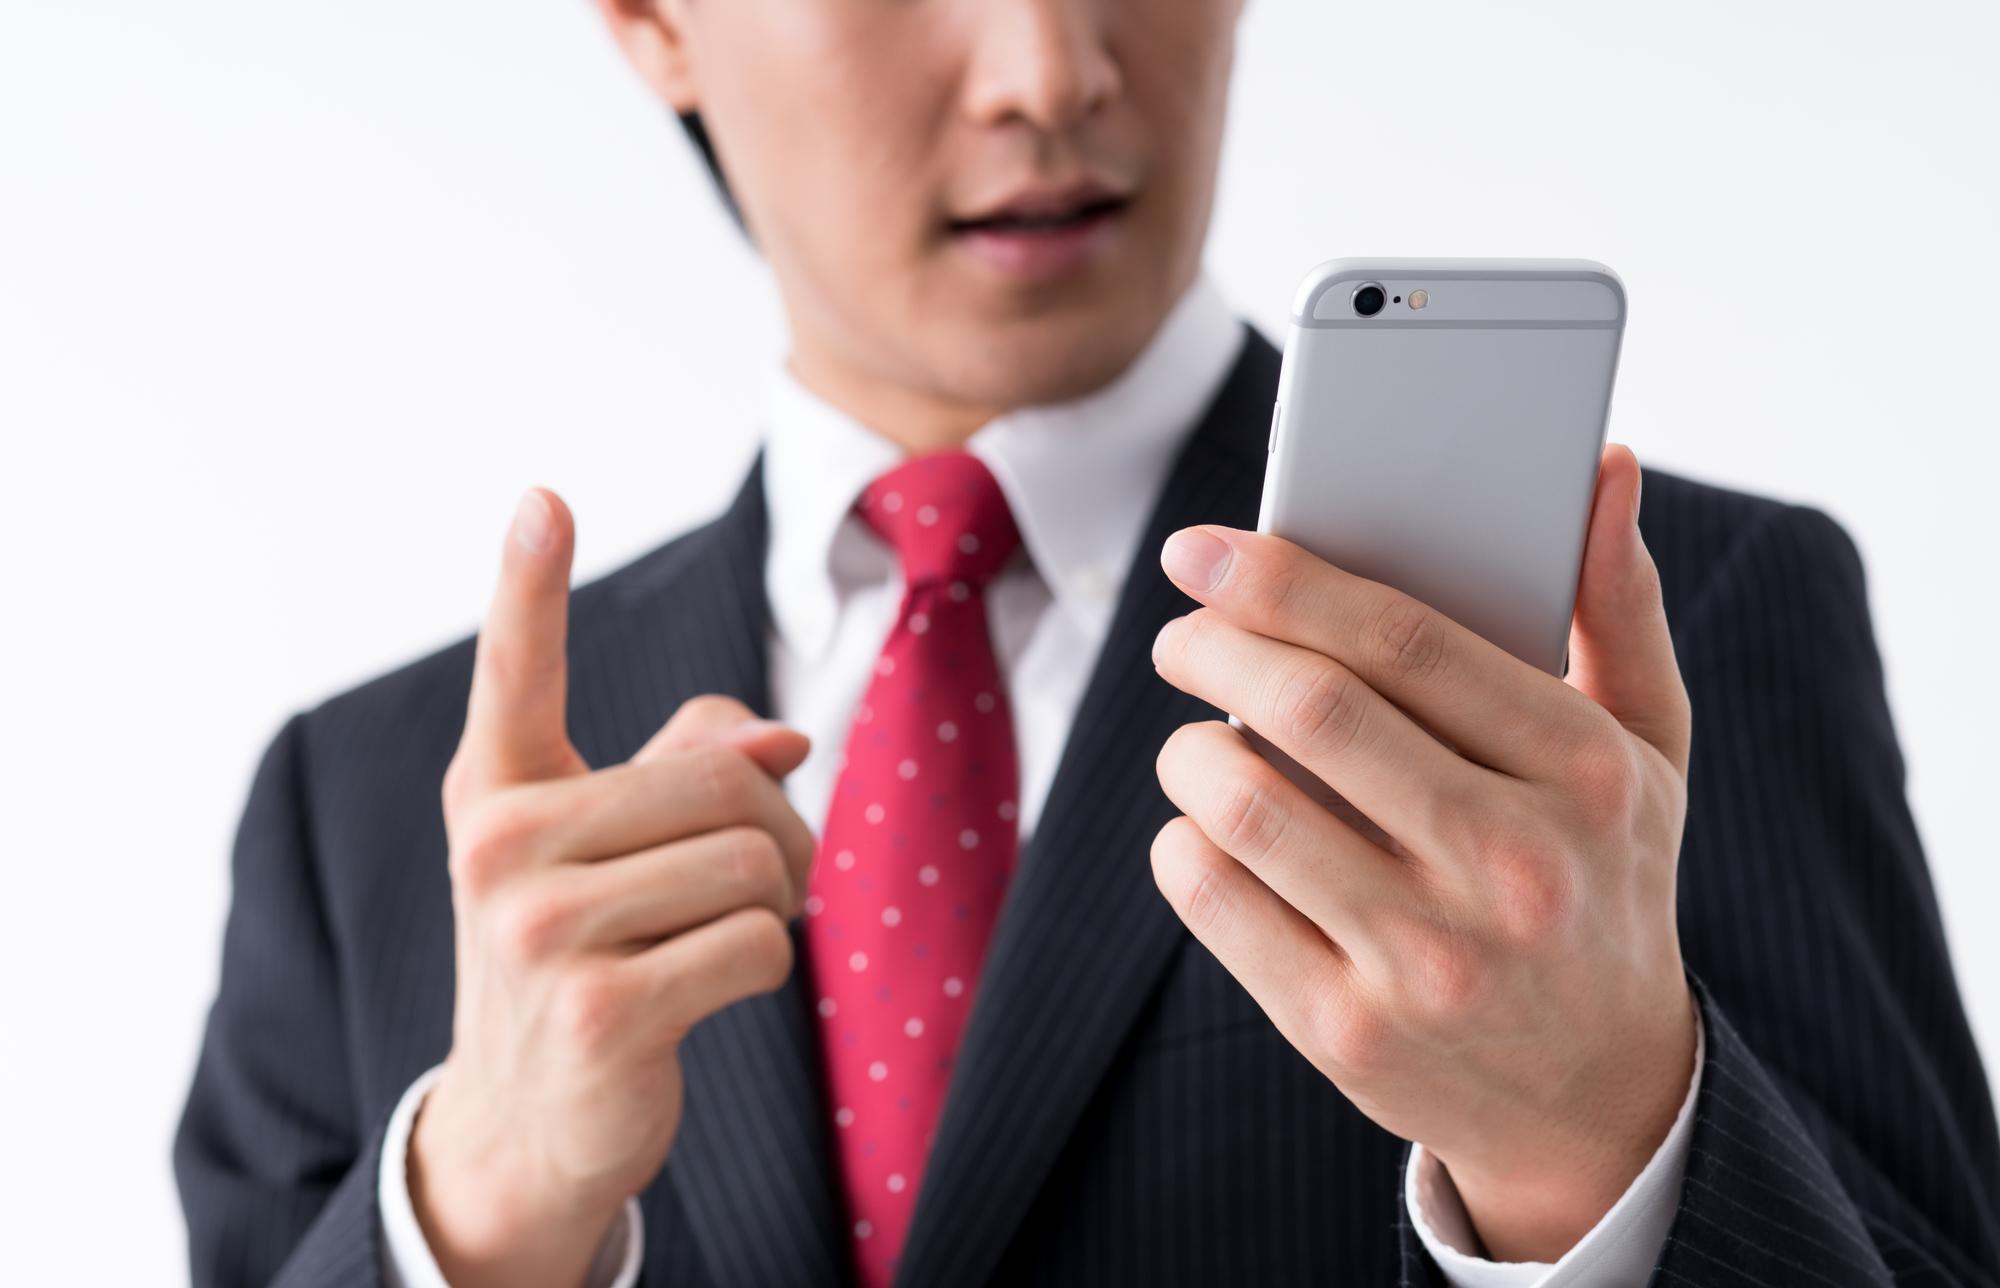 07_iphoneの画面が割れた!修理に必要な値段と時間、バックアップ方法を解説